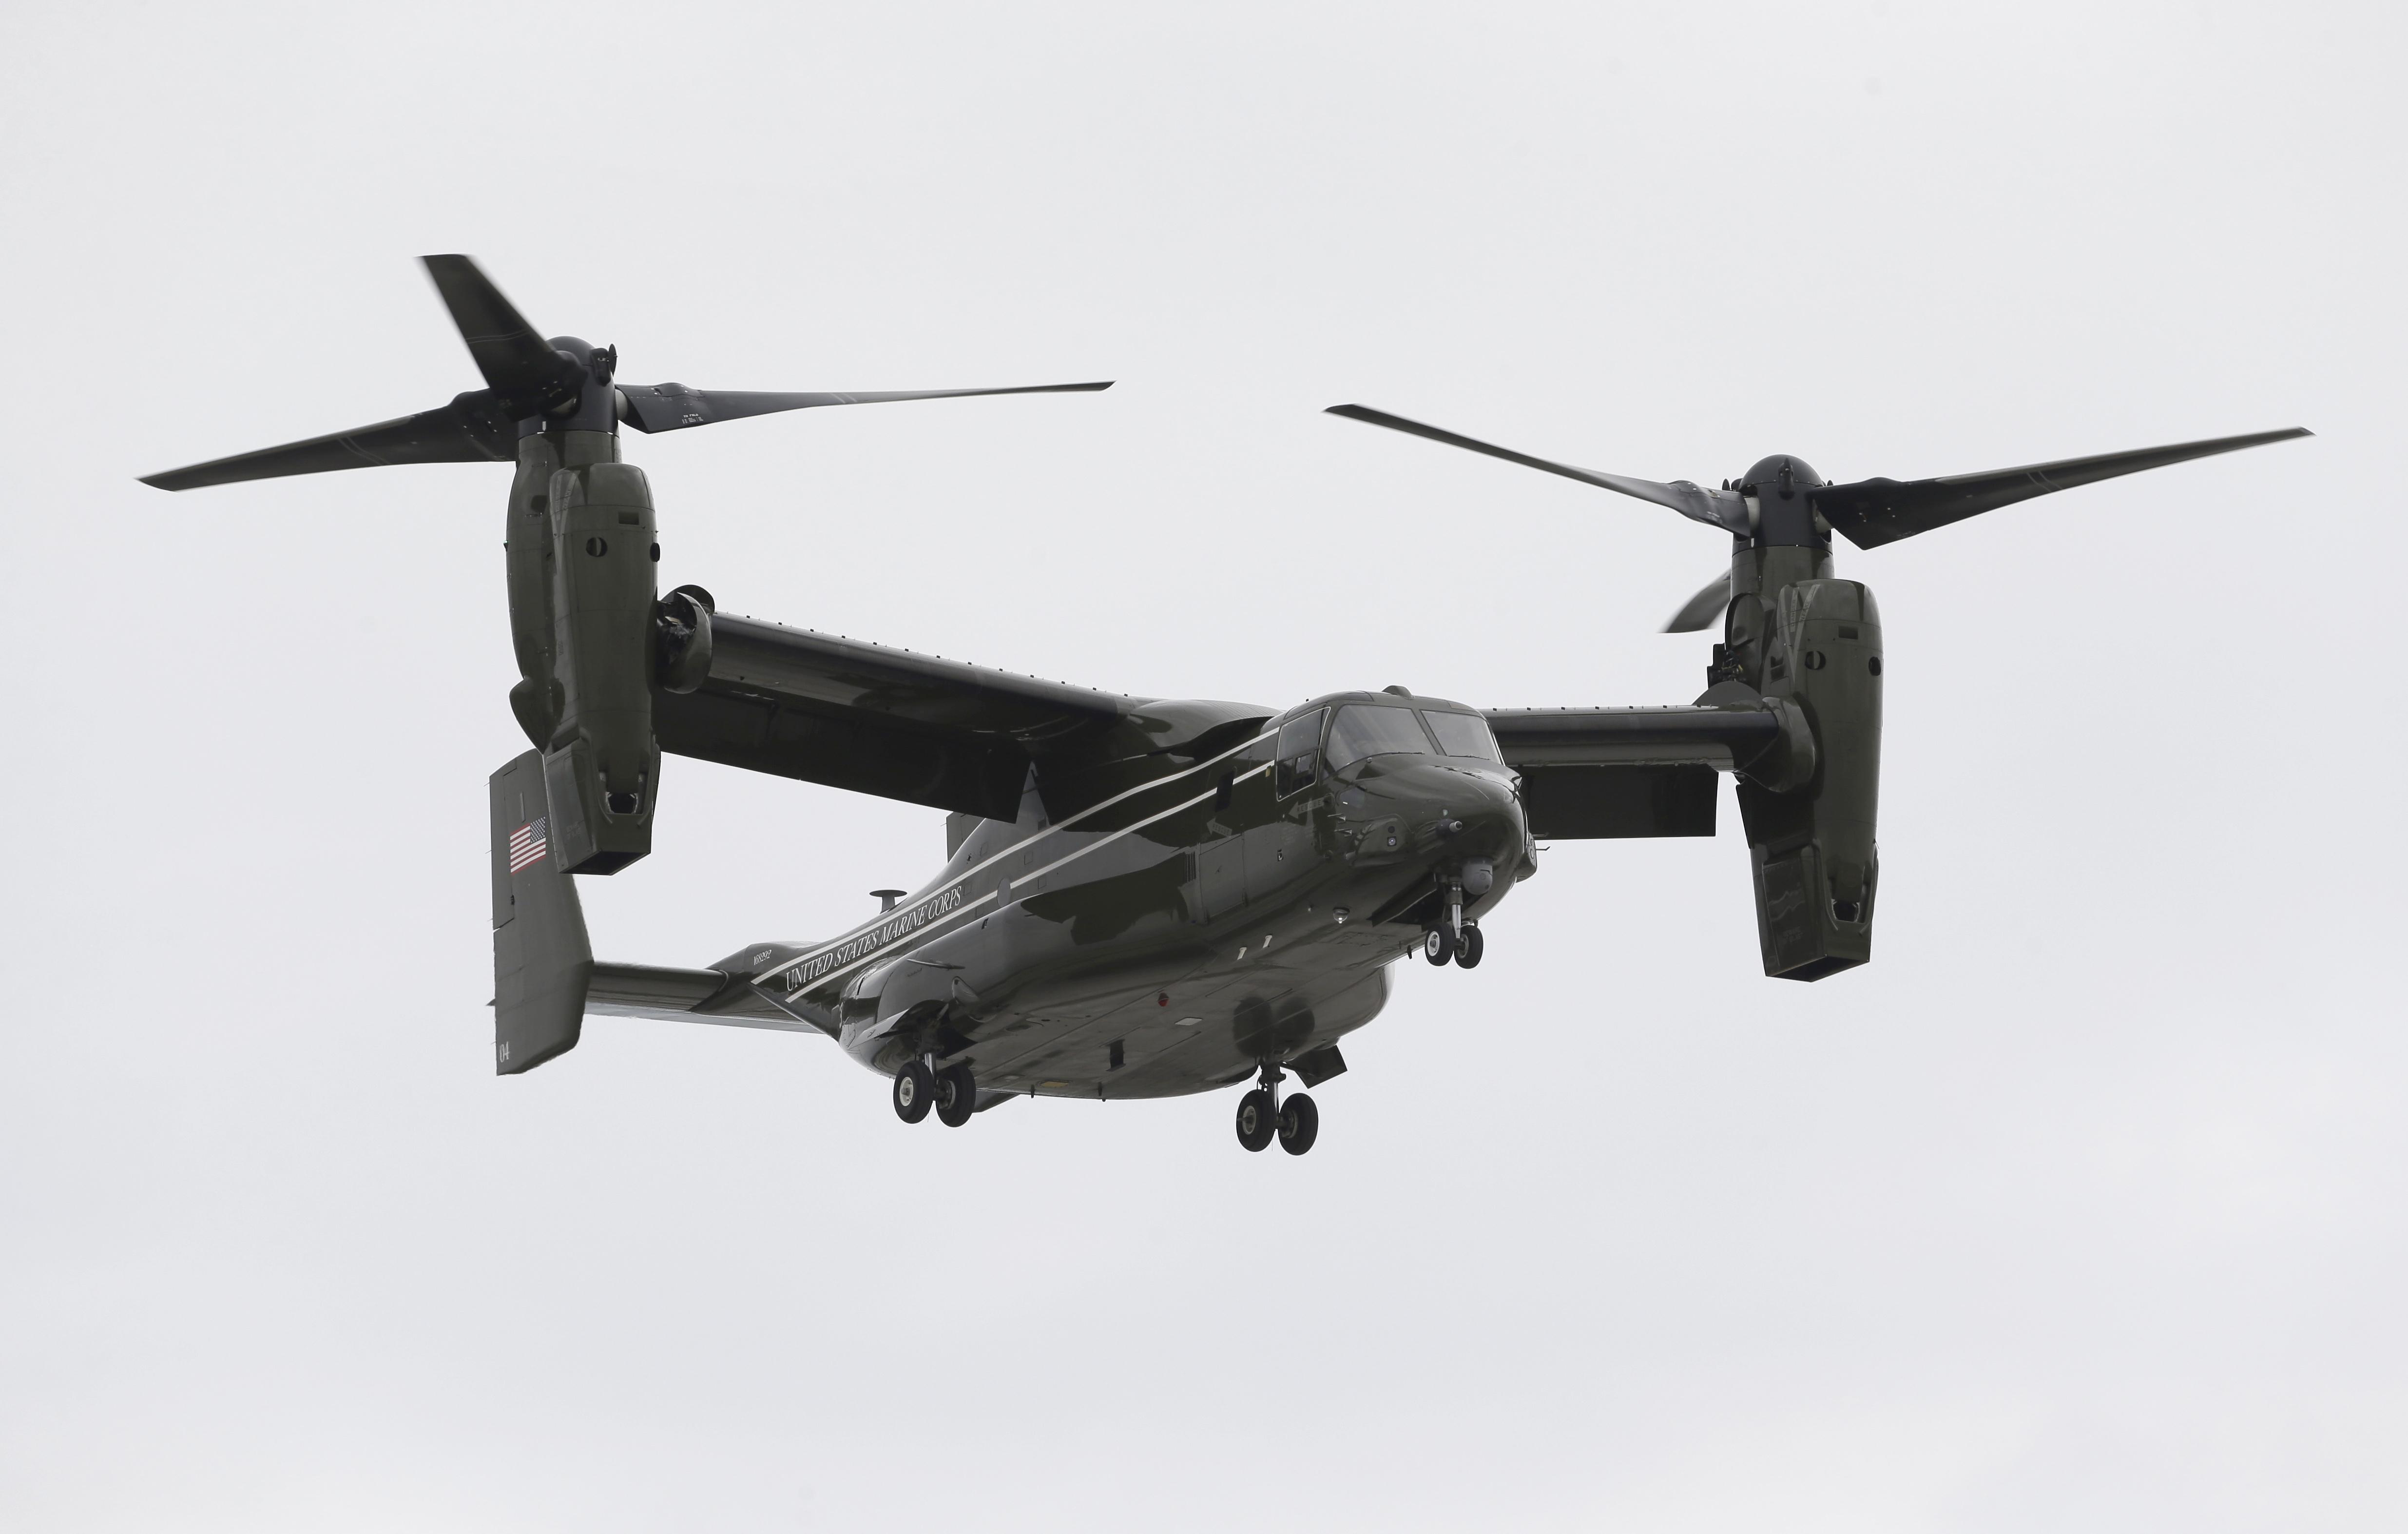 3 Marines Missing After Aviation Mishap Involving MV 22 Osprey Off Australian Coast